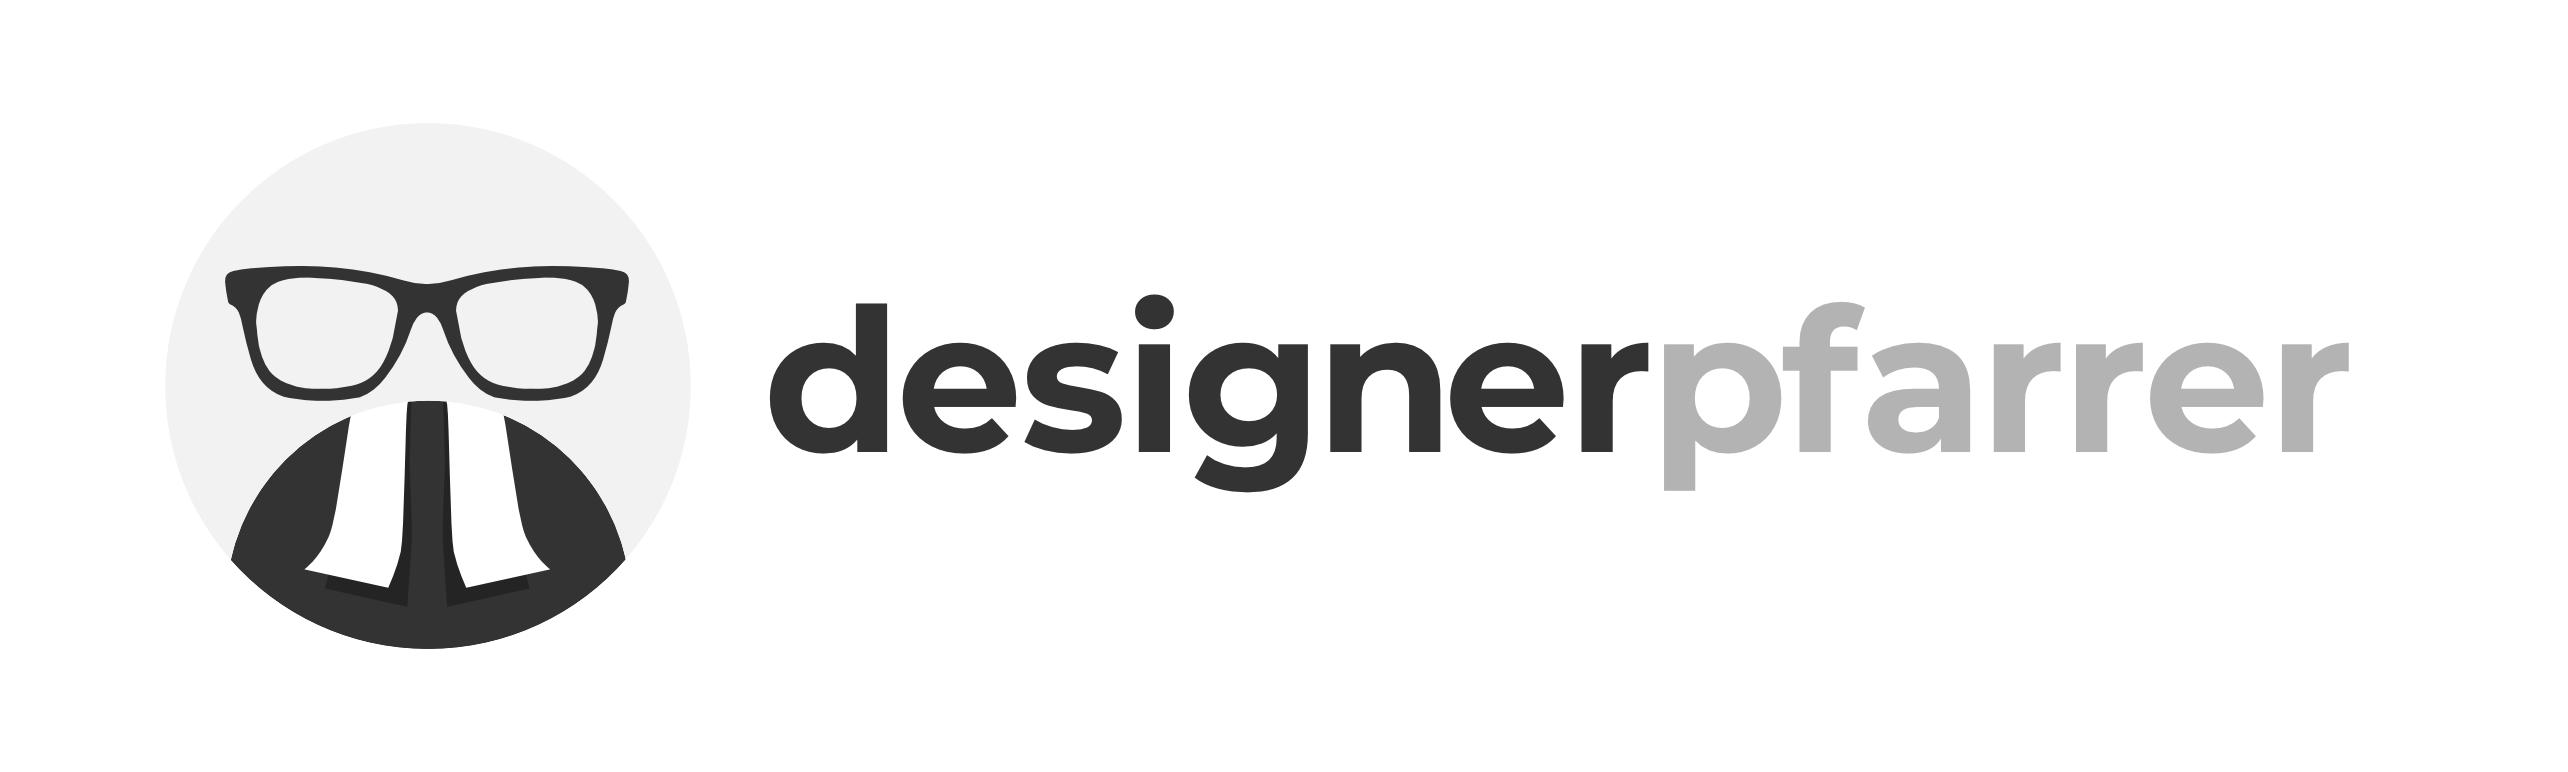 Designerpfarrer